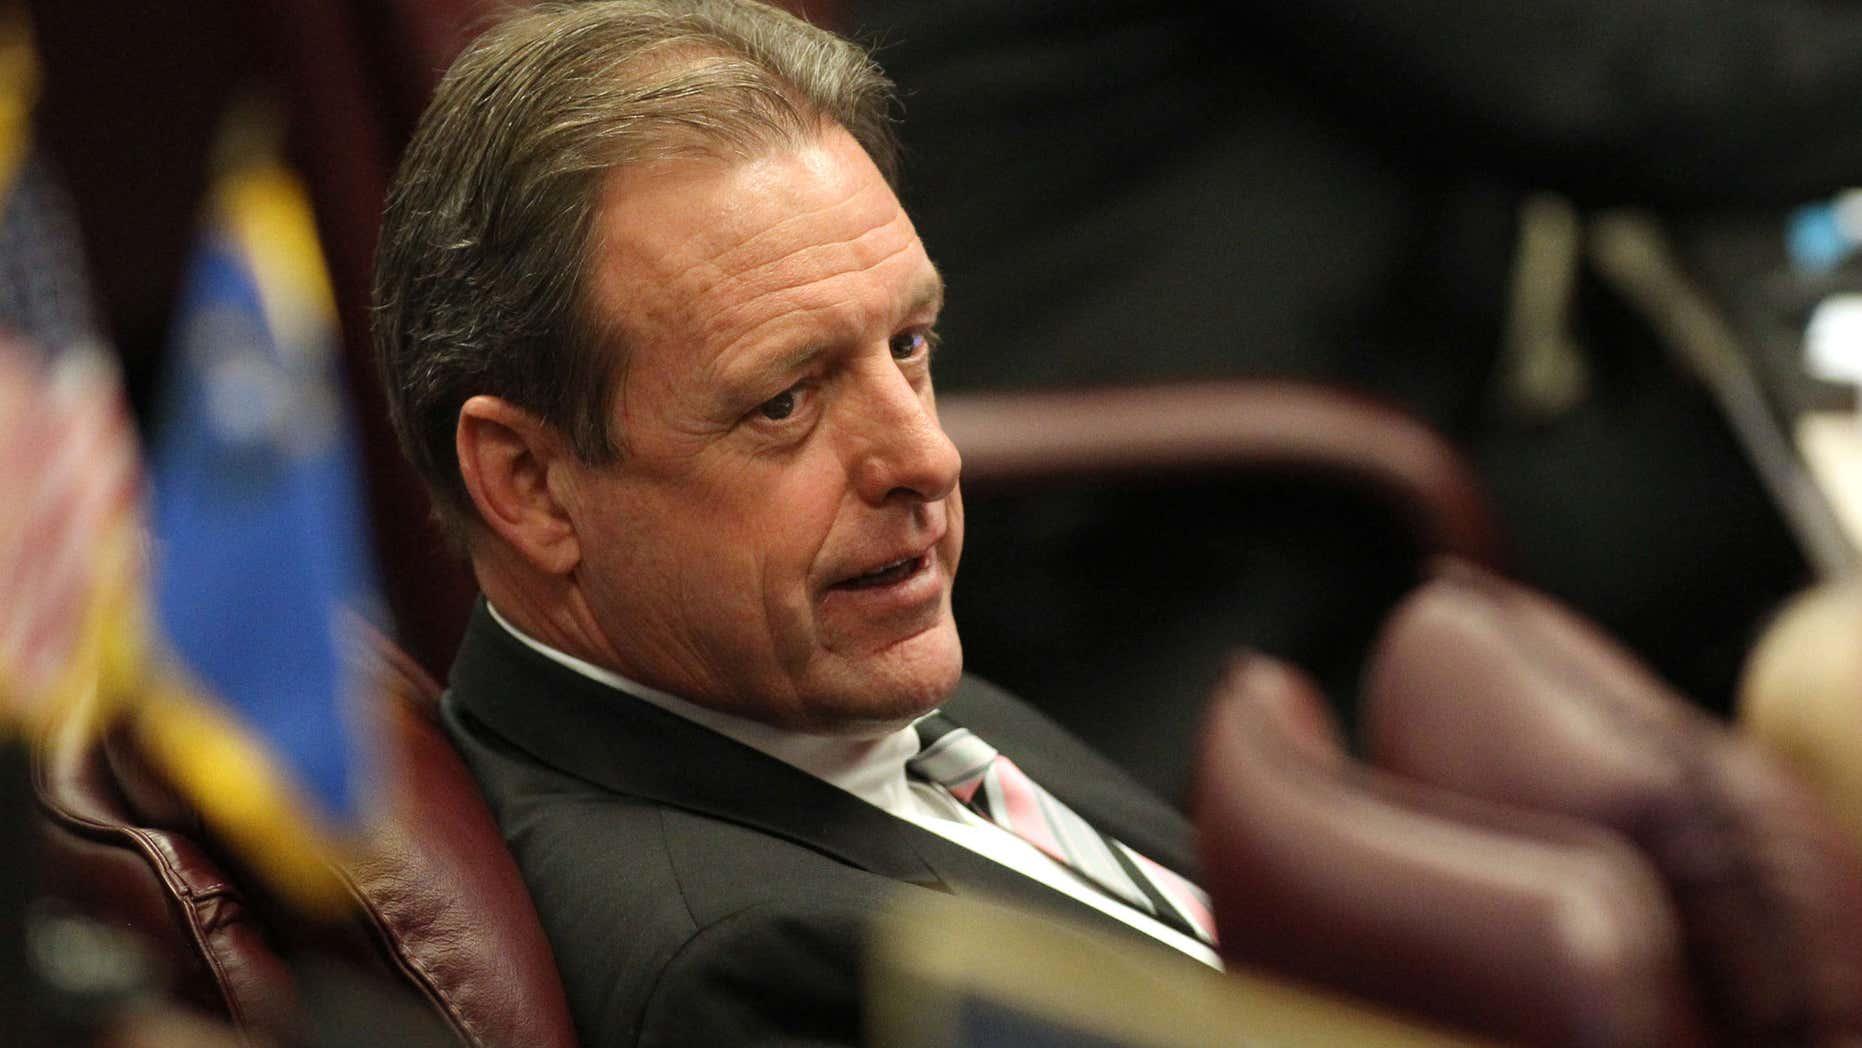 May 23, 2011: Former Nevada Sen. John Lee, D-North Las Vegas, at work on the Senate floor at the Legislature in Carson City, Nev.